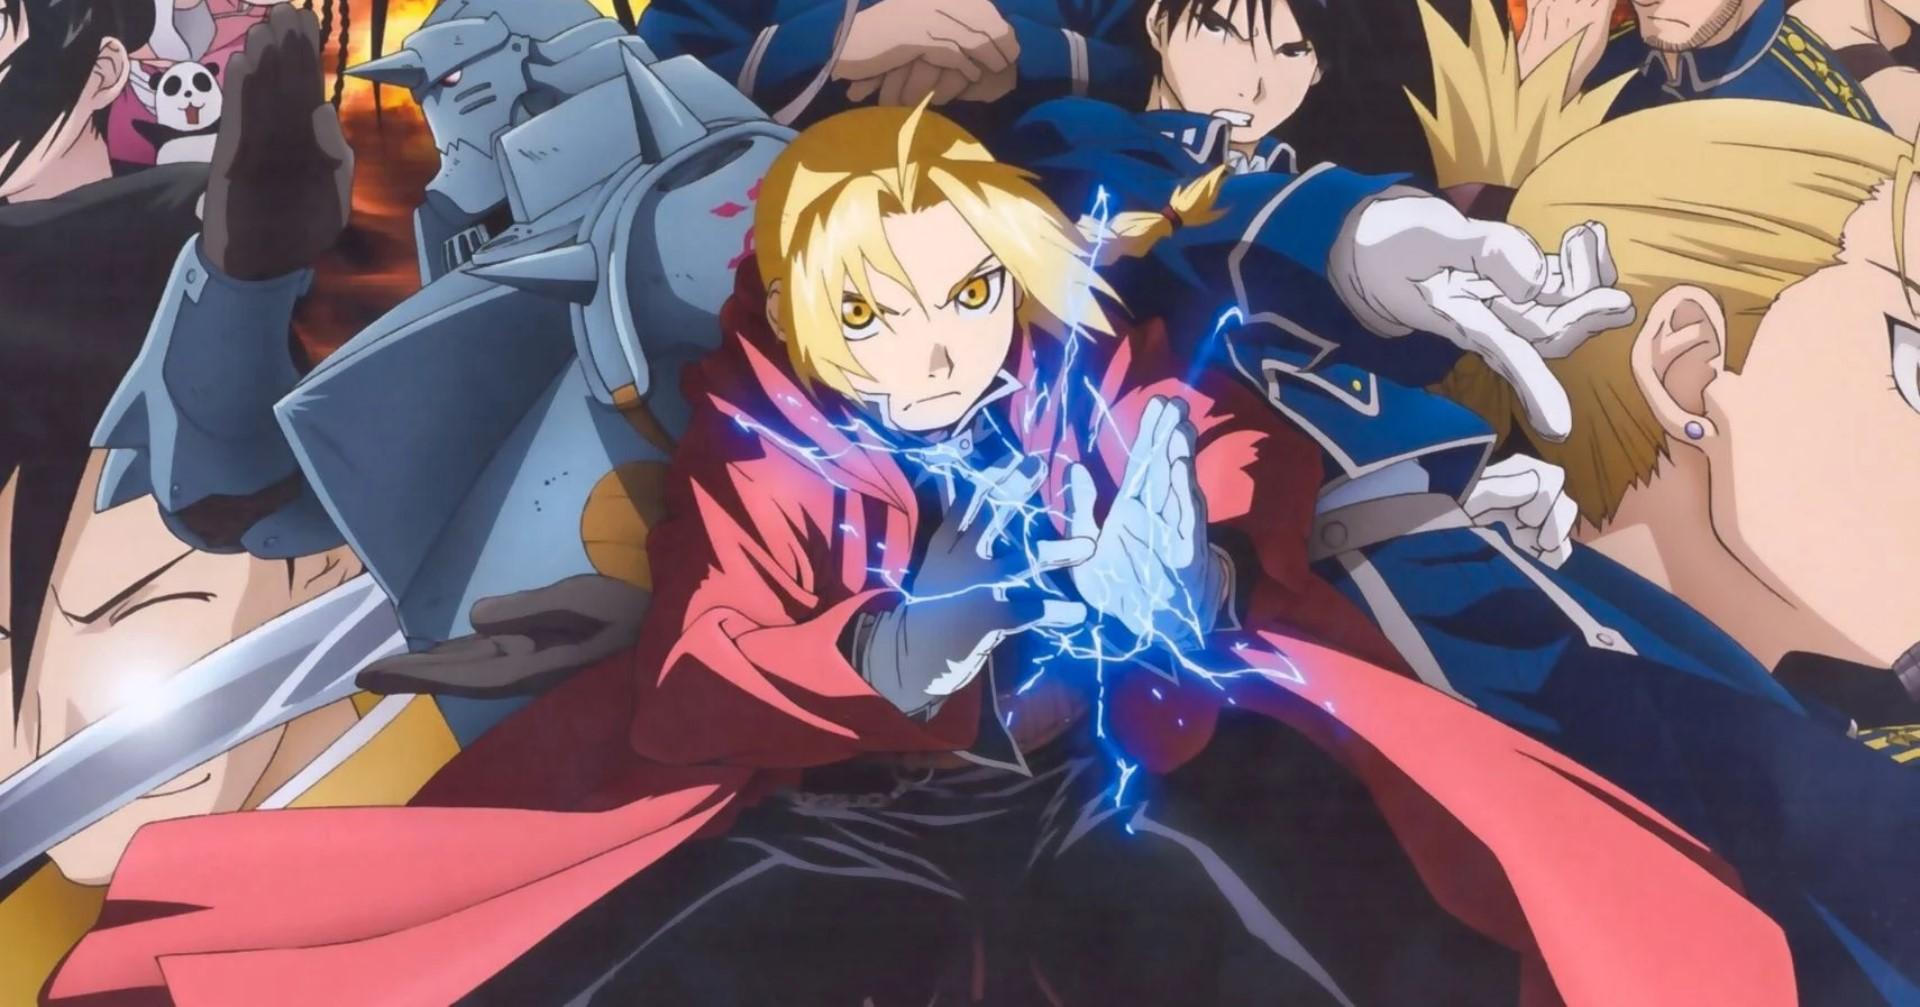 Fullmetal Alchemist Watch Order!